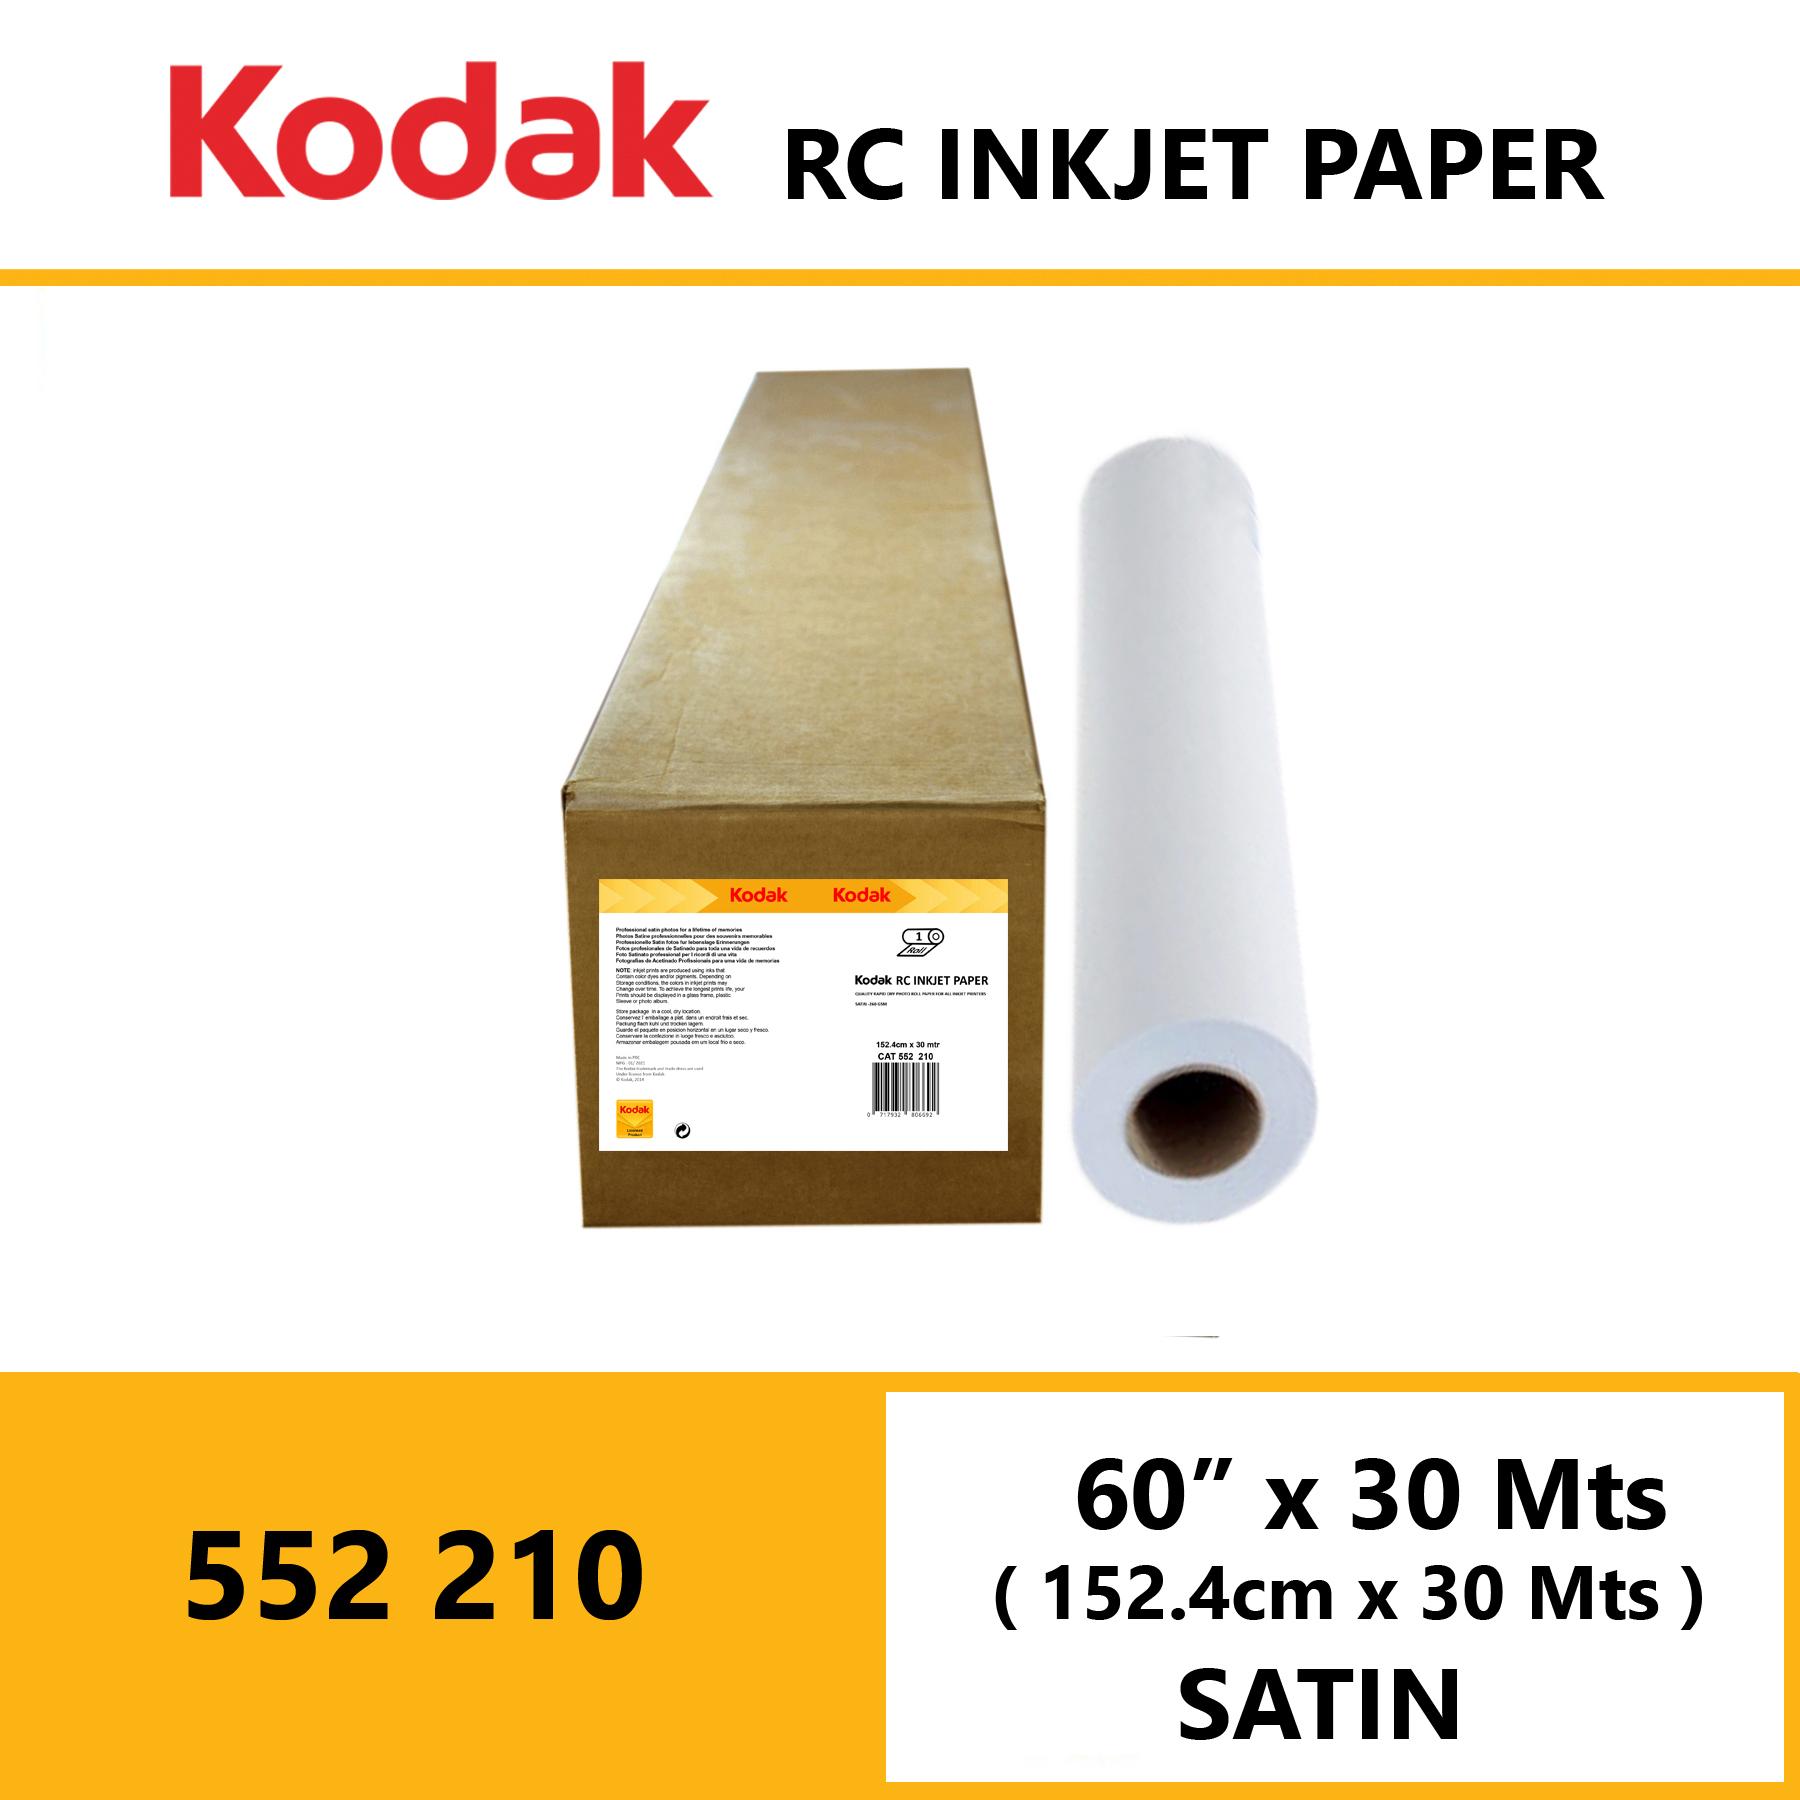 "Kodak Inkjet RC Paper 60 "" x 30 Mtrs Satin"